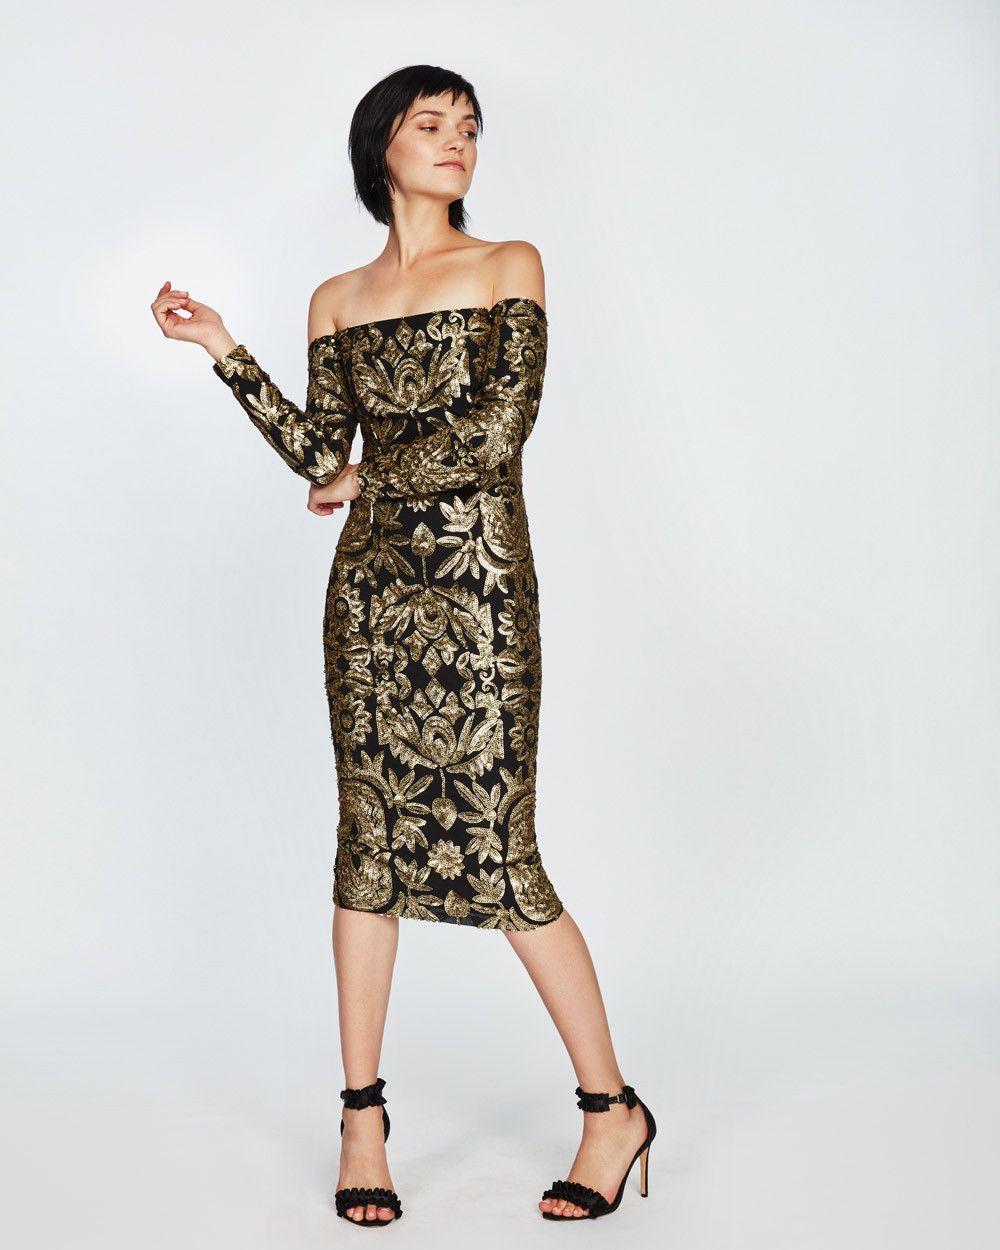 New Arrivals | LBD | Pinterest | Floral sequin dresses, Sequins and ...